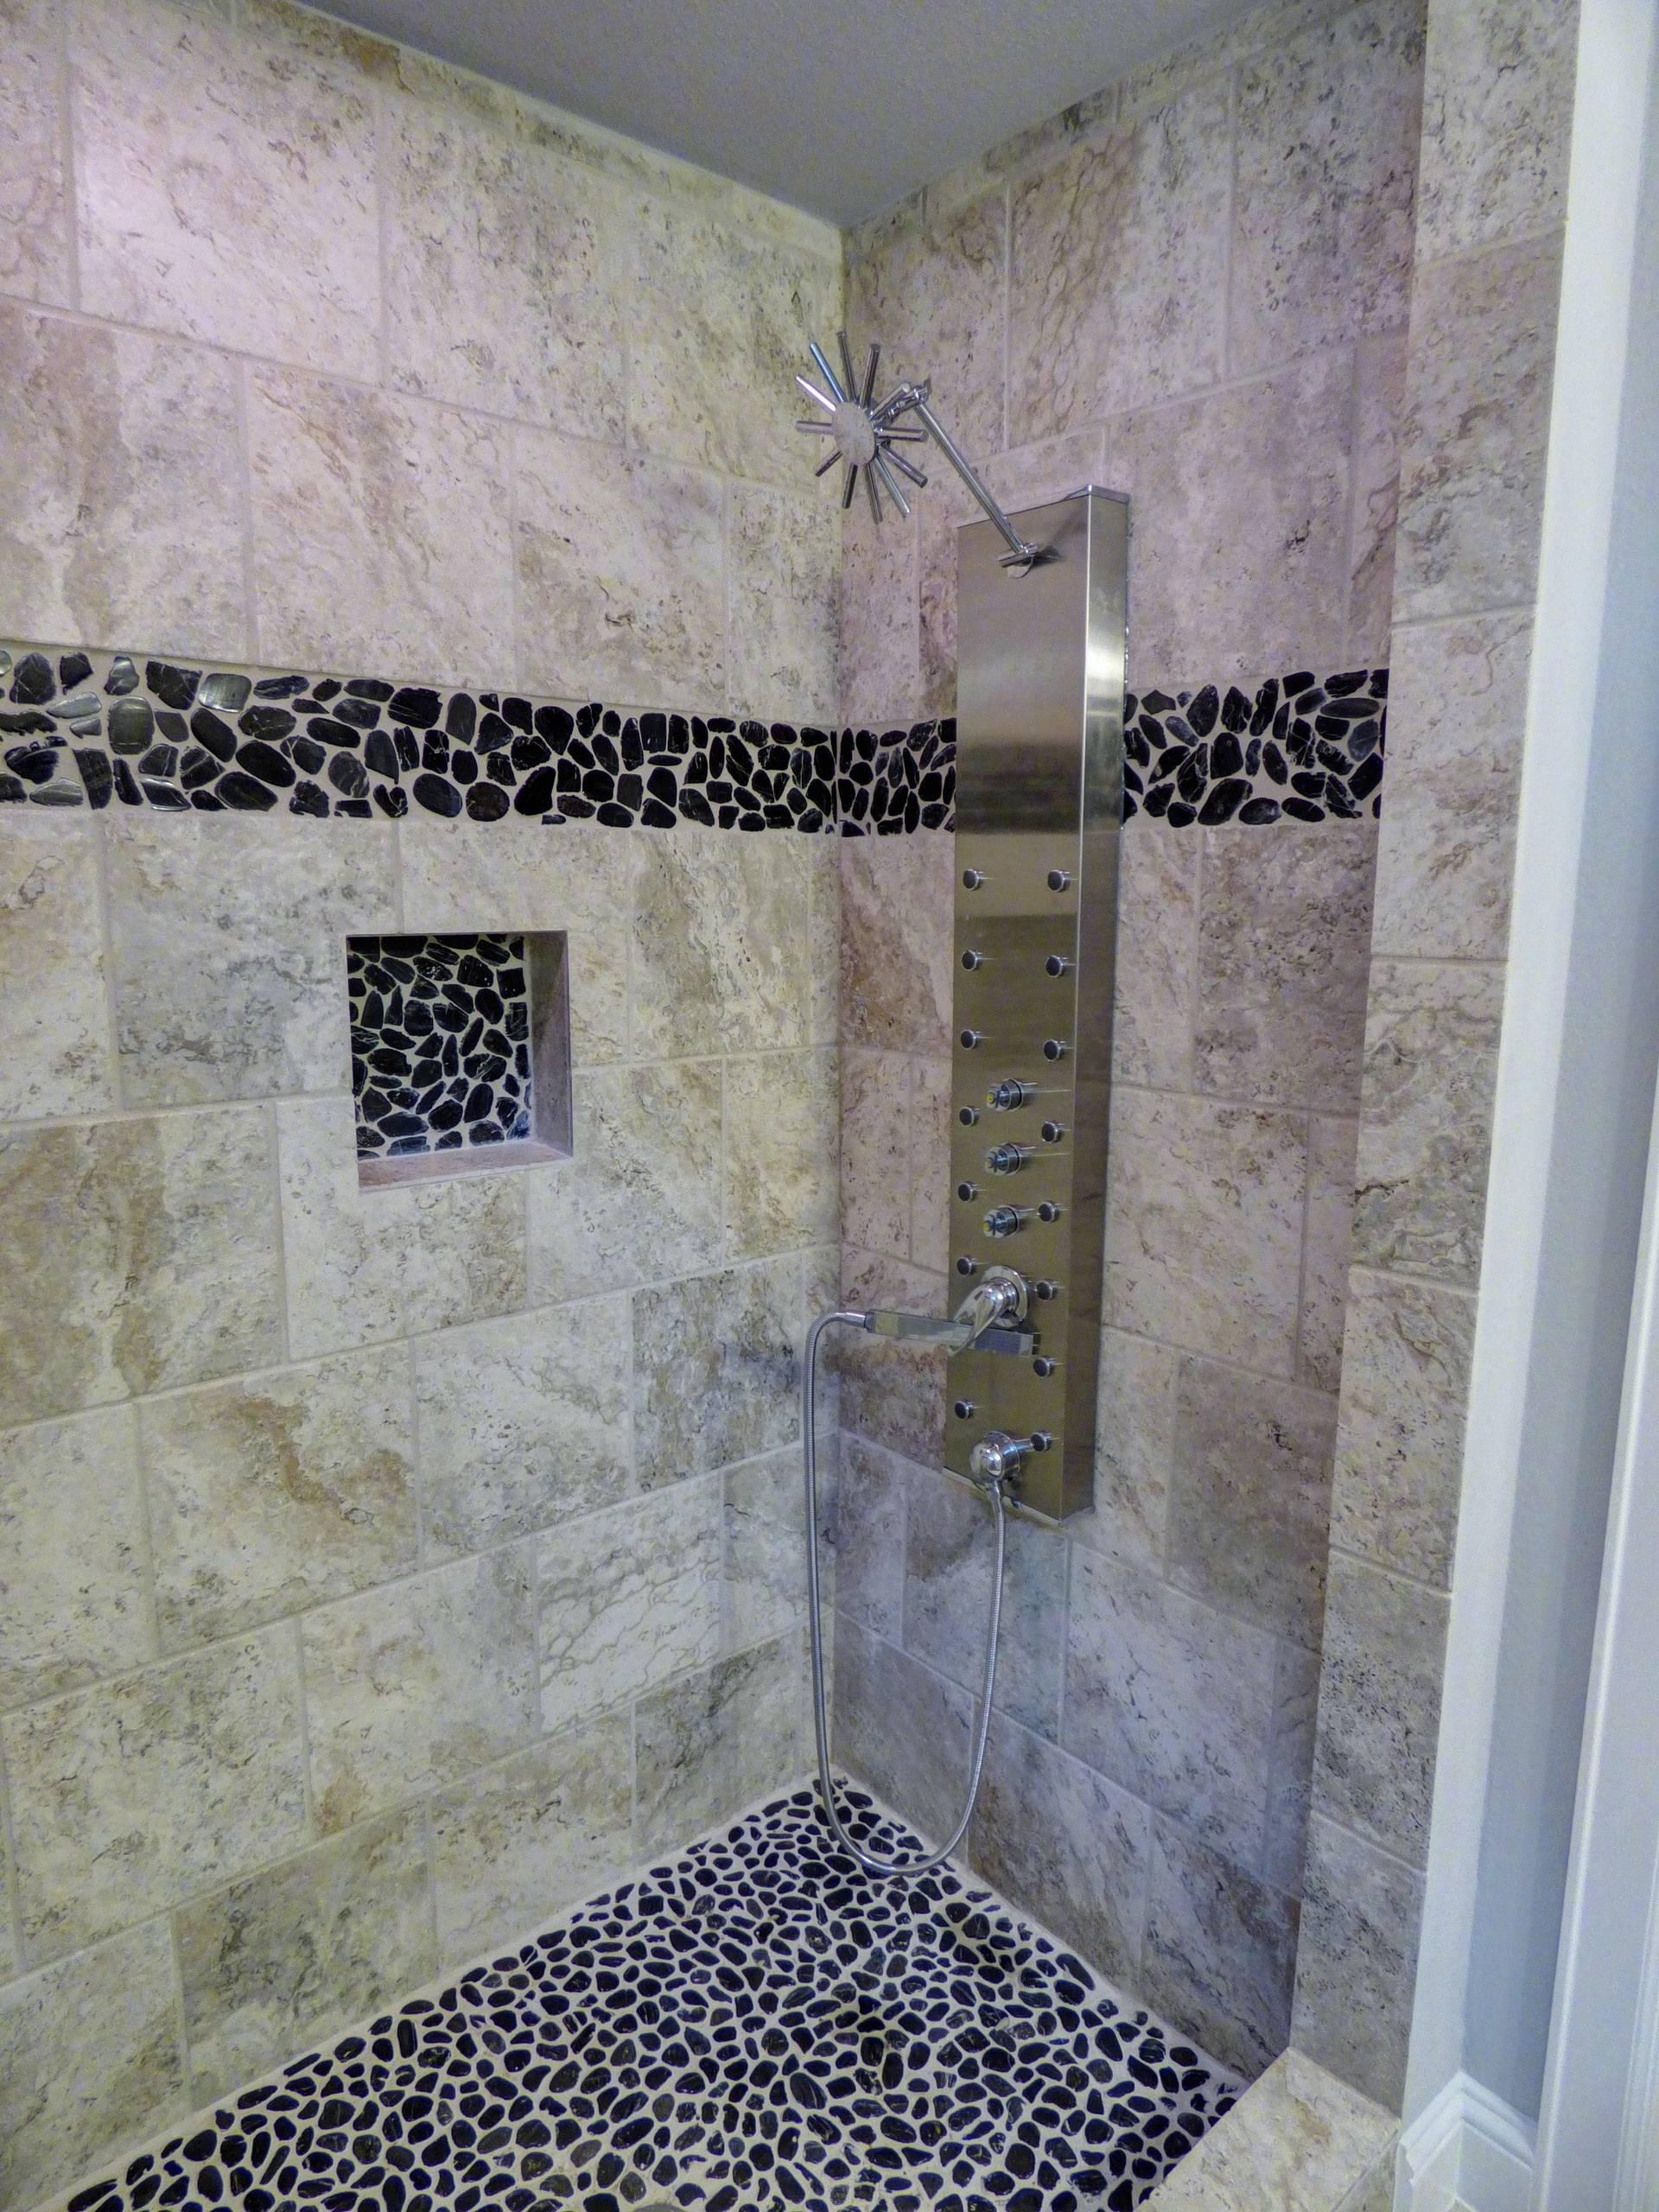 The Oasis of Westbury Man's Master Bathroom